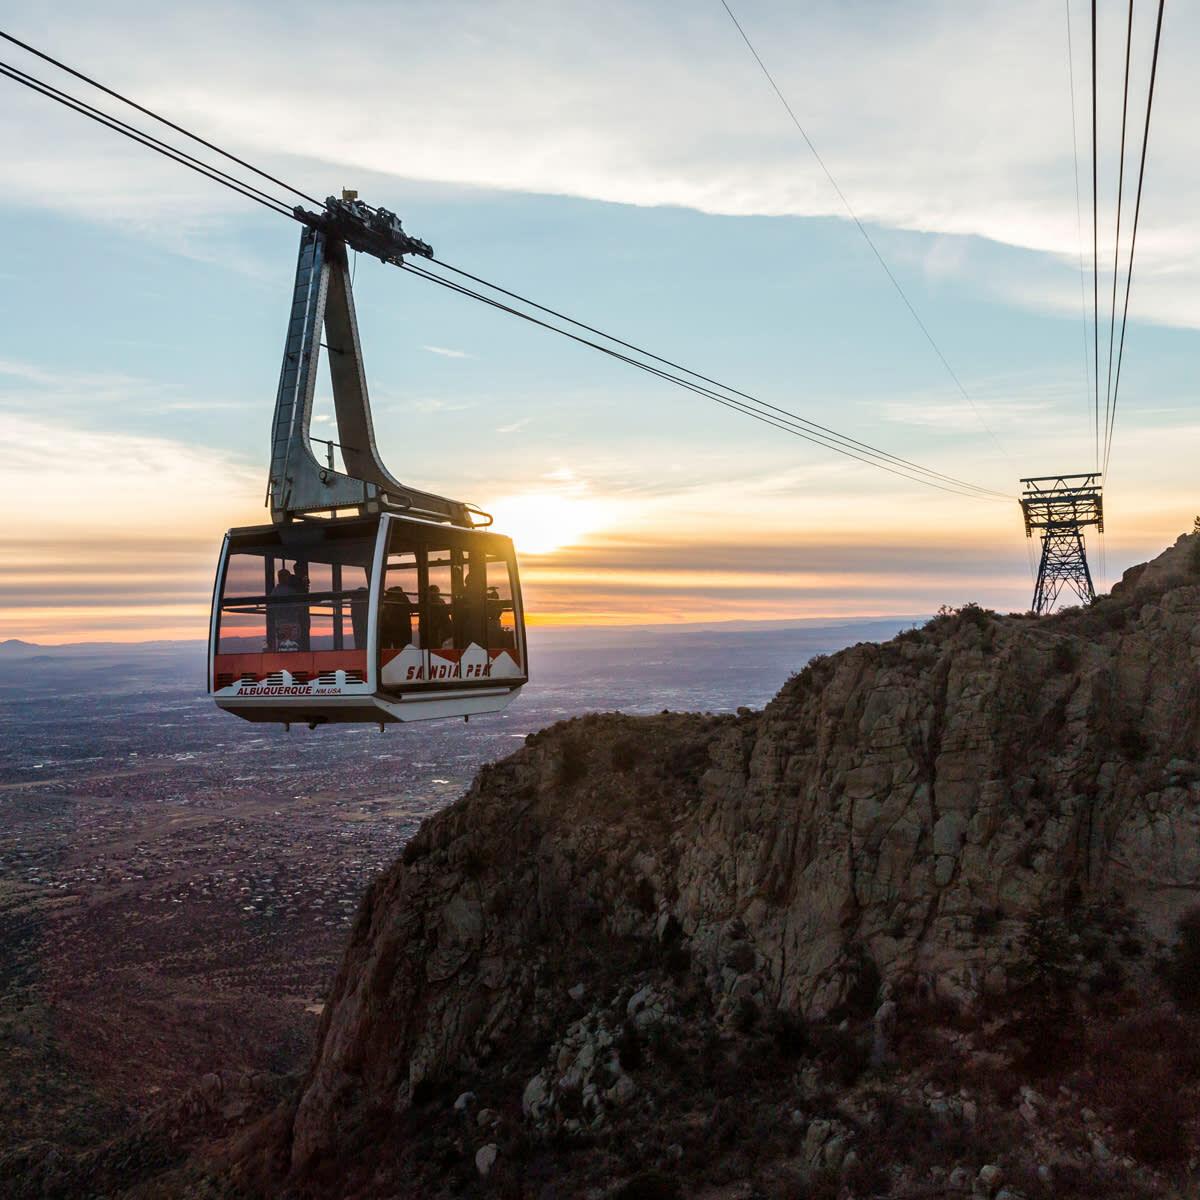 Sandia Peak Tram 90 d1f7044e5056a36 d1f705d0 5056 a36a 092f086ae032e805